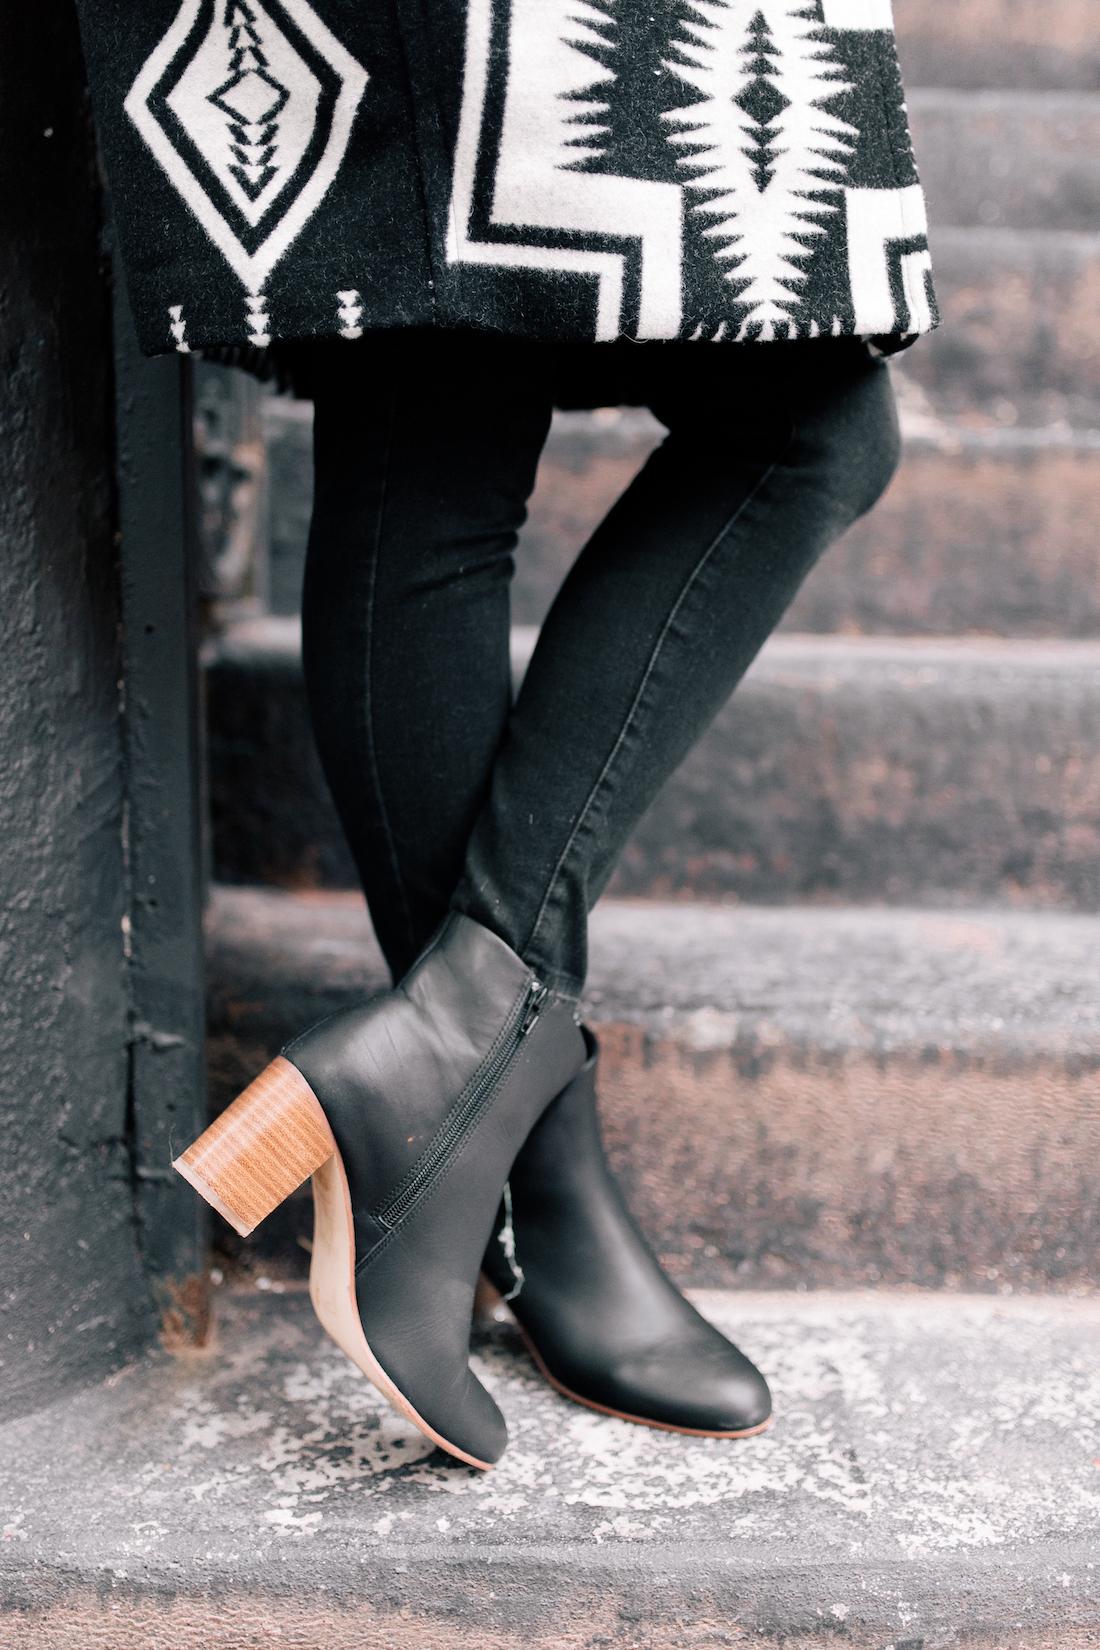 Pendleton Coat(c/o) //American Eagle Jeans //Soludos Boots